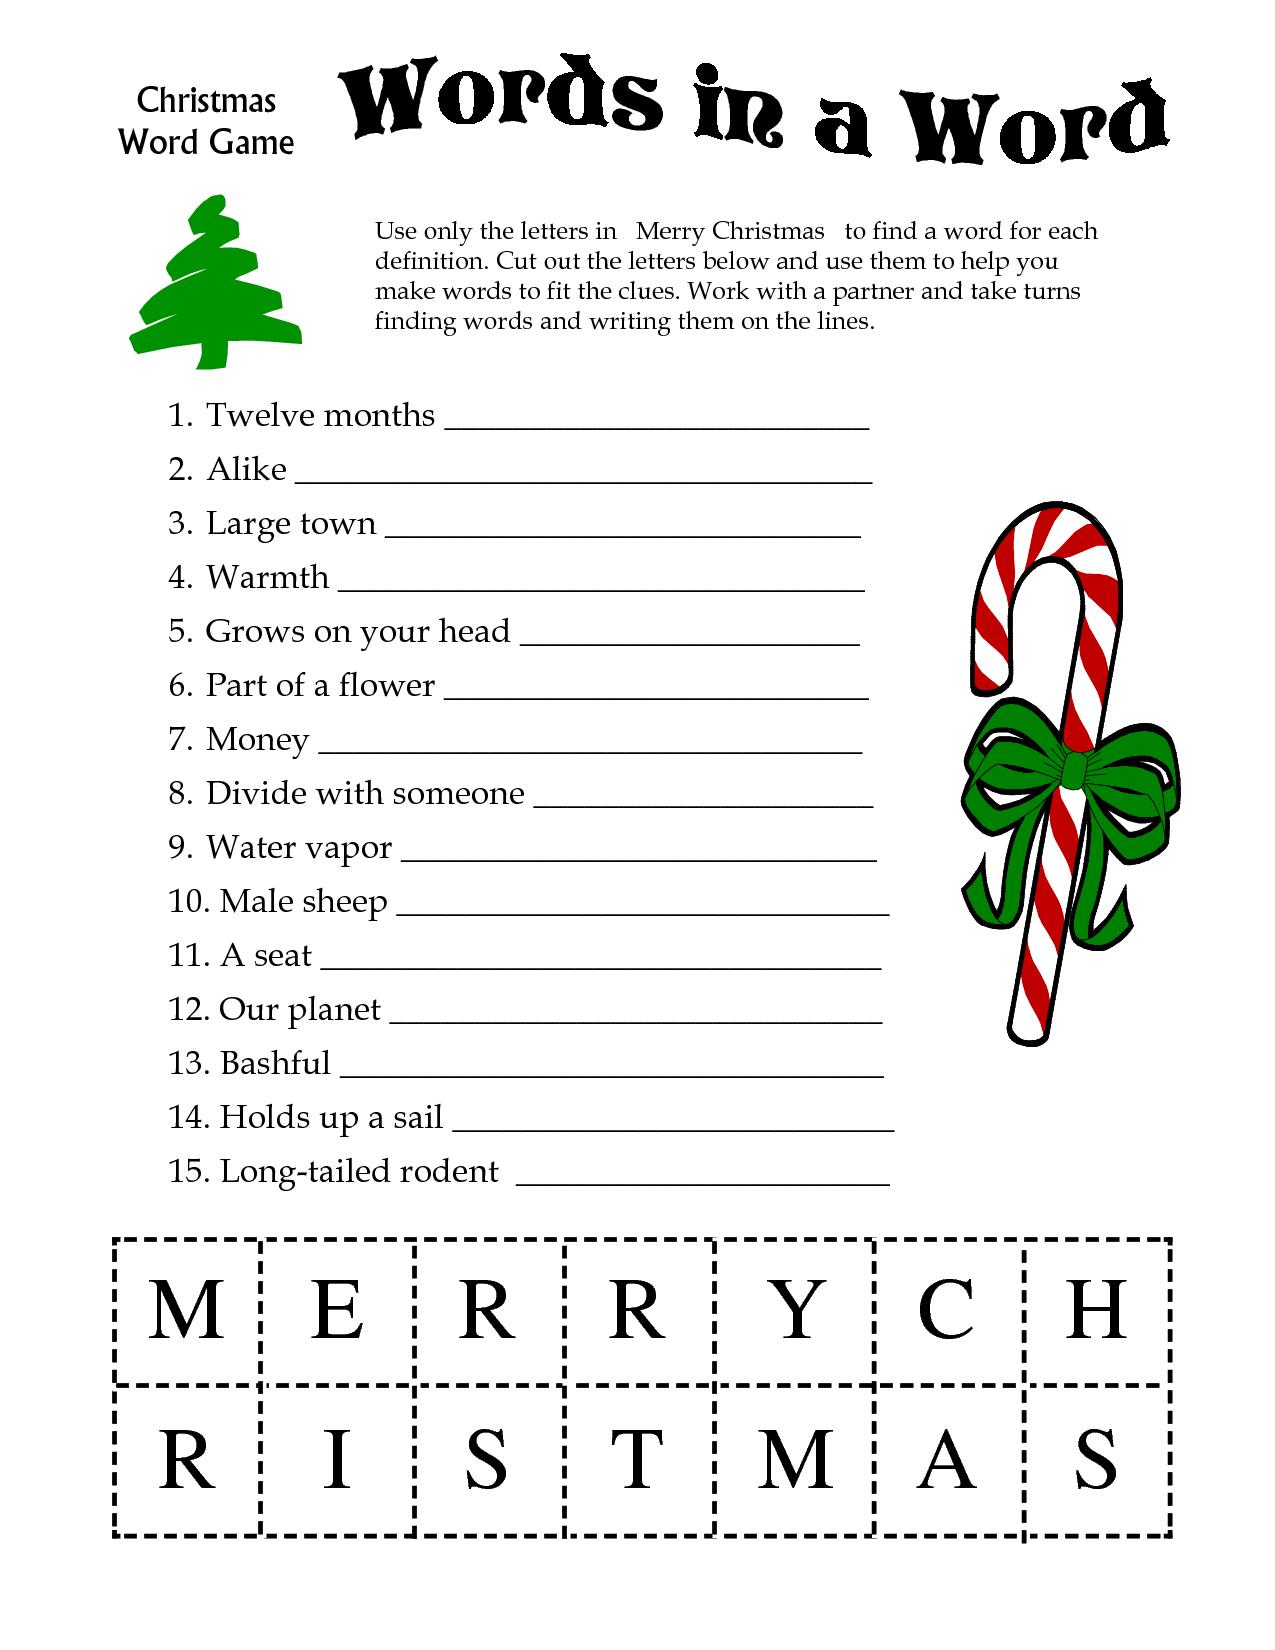 5 Images Of Free Printable Christmas Word Games | Printablee - Free Printable Christmas Puzzles